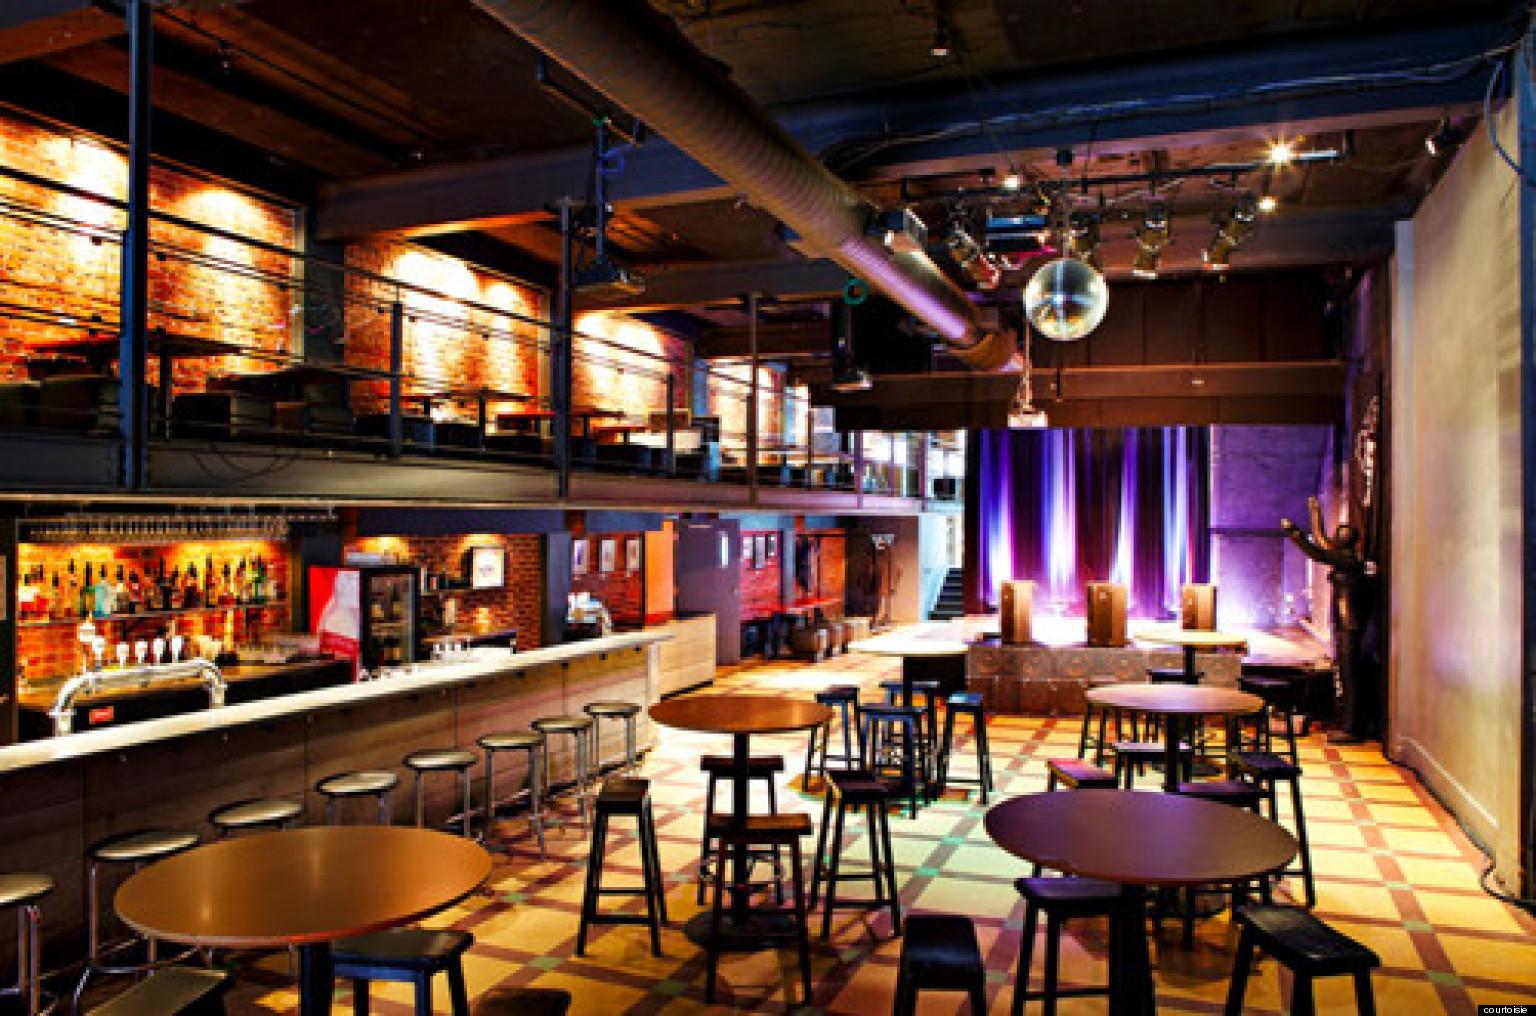 Bar rencontre st-hyacinthe